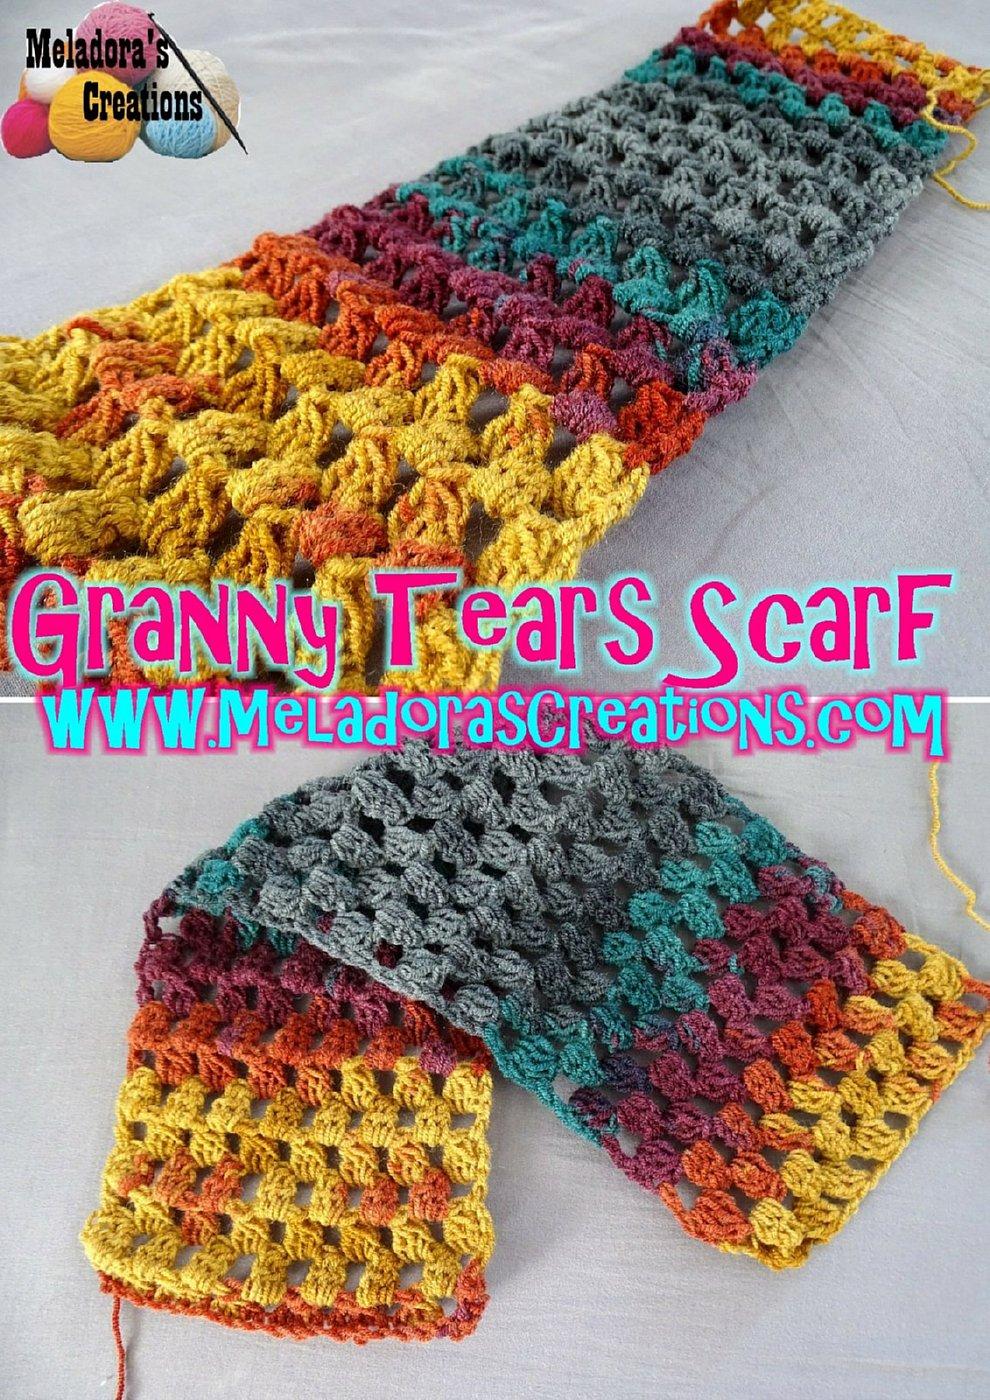 Granny Crochet Scarf- Free Crochet Pattern - Granny Tears Scarf